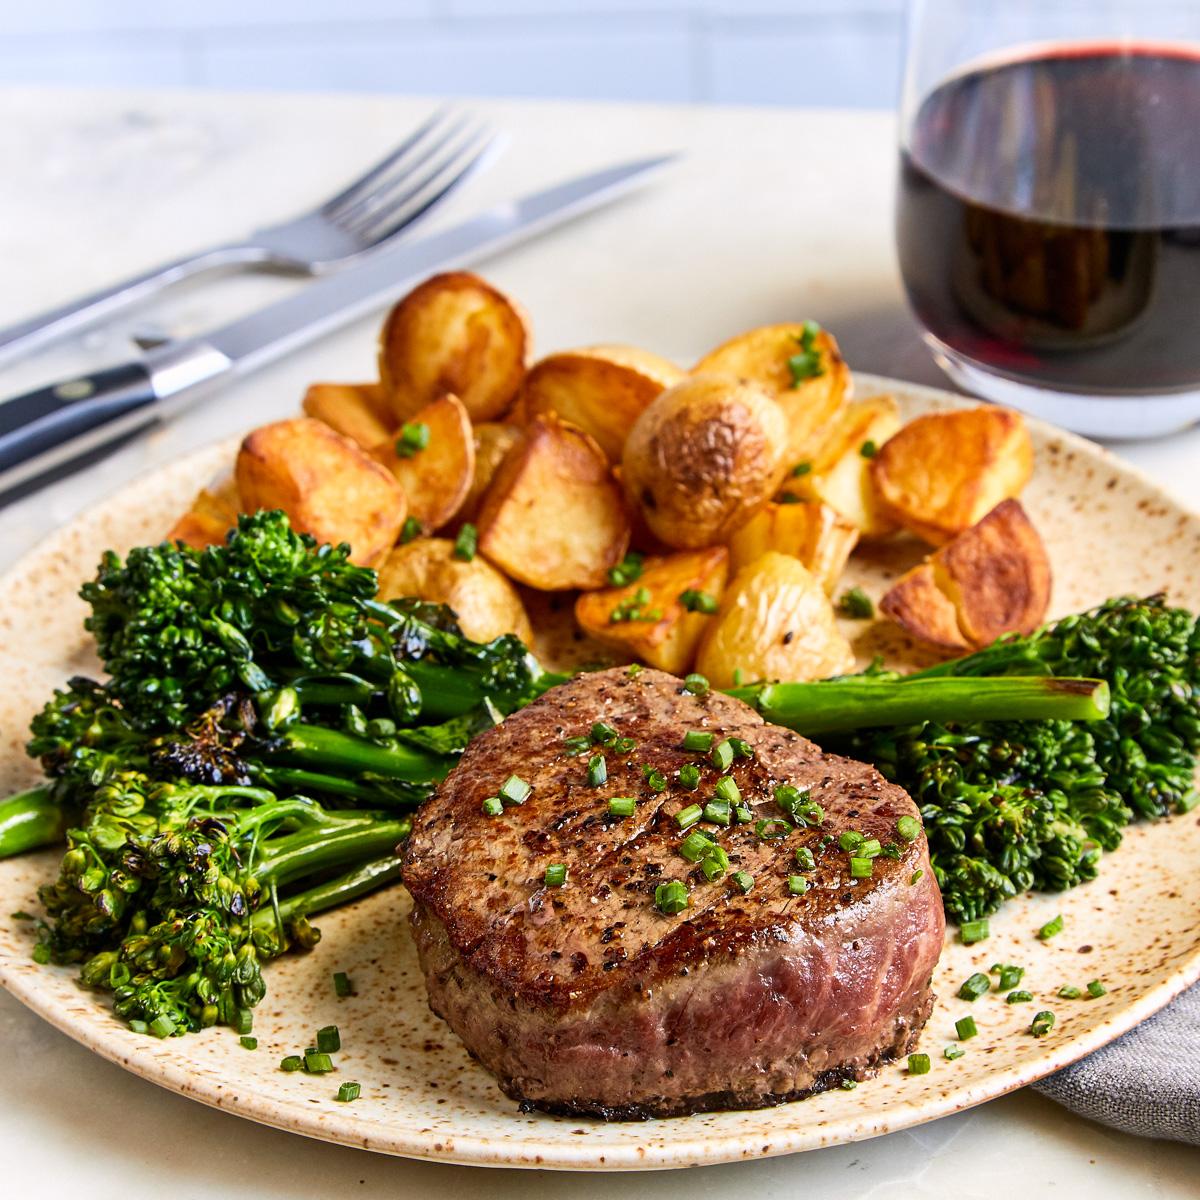 Filet Mignon, Potatoes, and Baby Broccoli - Serves 2 — Brava | Brava Home